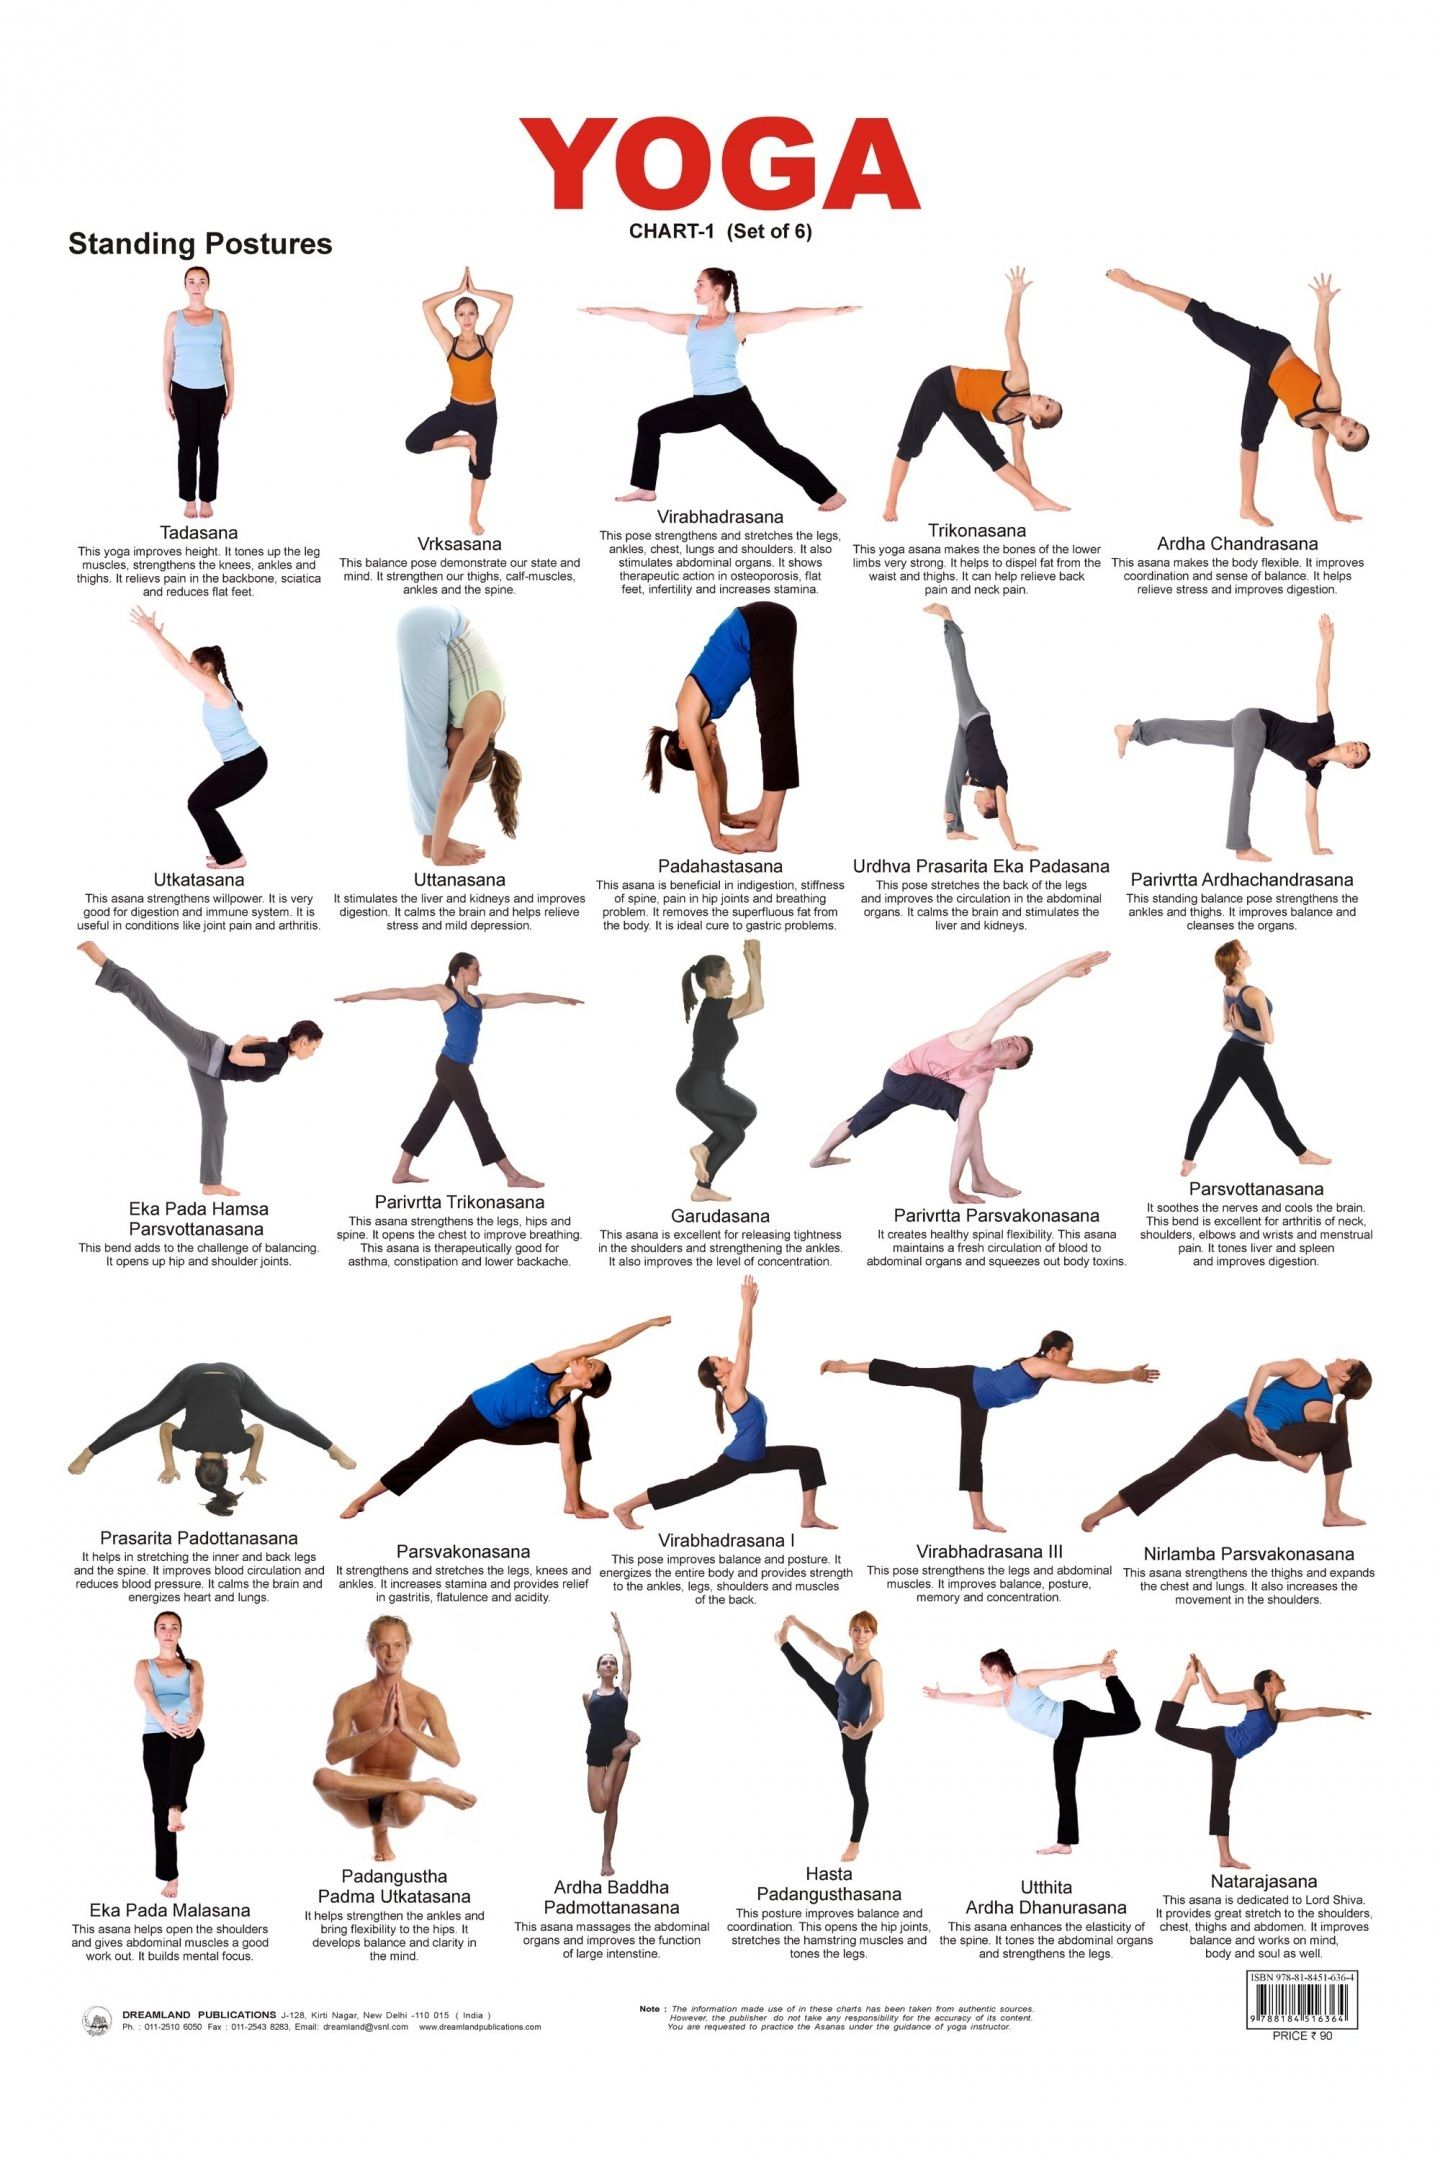 Iyengar Yoga Poses Chart Ik Kzjxi Positions   Fitness   Pinterest ...